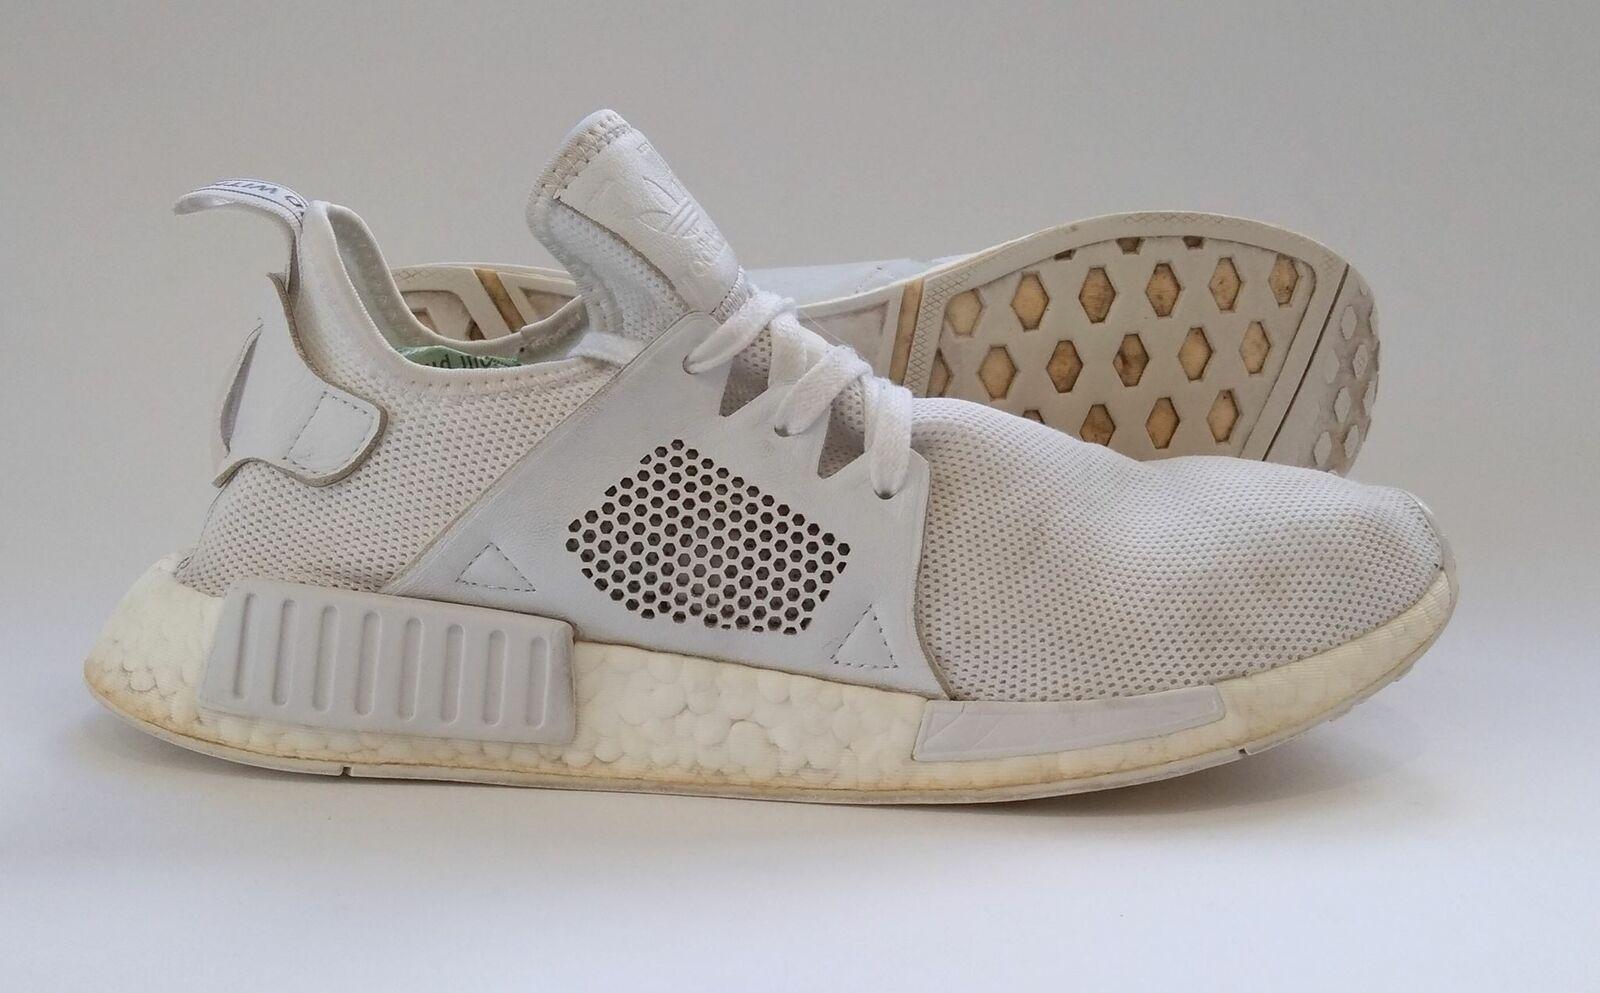 Adidas Nmd Xr1 Triple White By9922 Uk9 Us9 5 Ebay